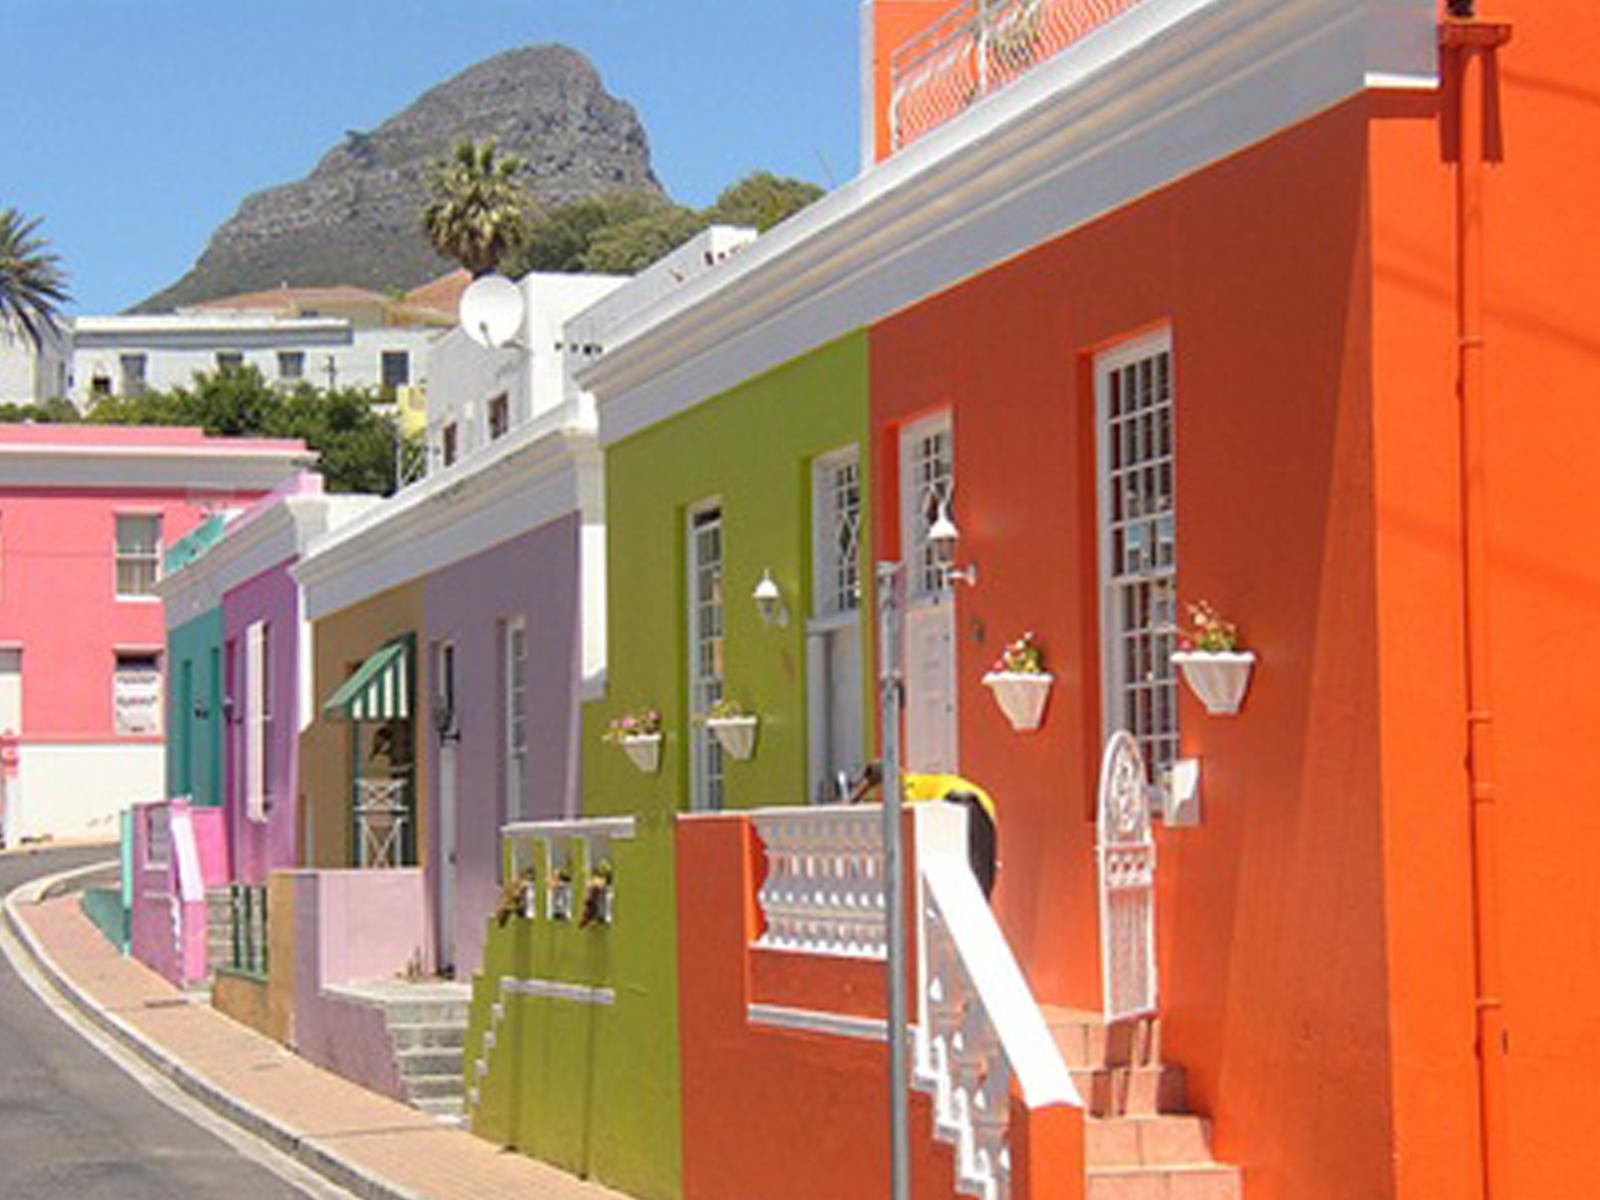 Pintura exterior esmalte sobre estuco mariocastro1 for Colores para exteriores de casa